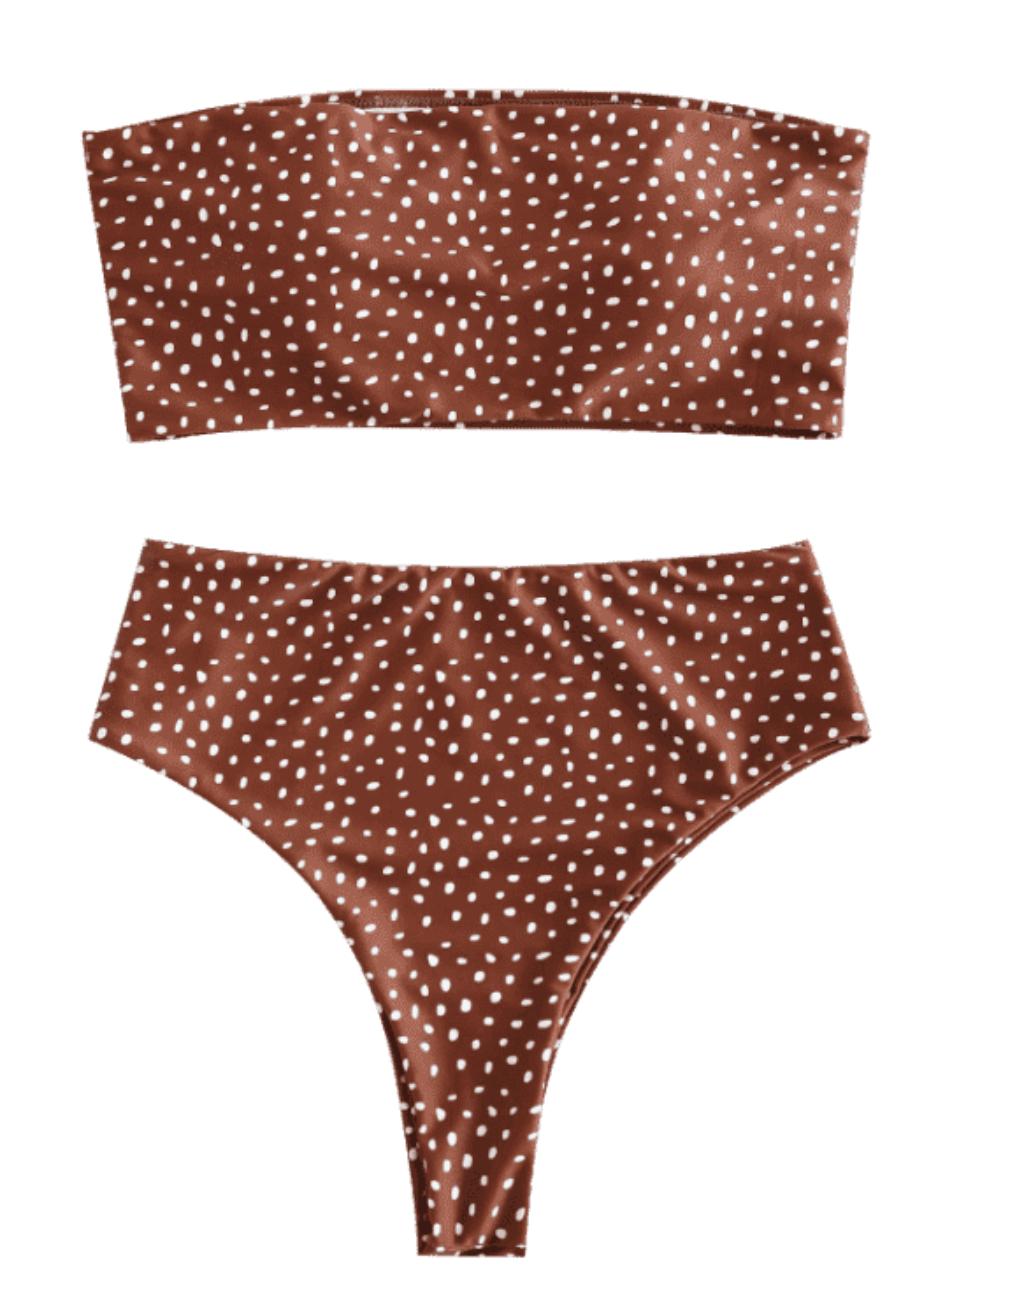 Spotted High Waisted Strapless Bikini - Light Brown | Honeymoon Bikinis | Miranda Schroeder Blog